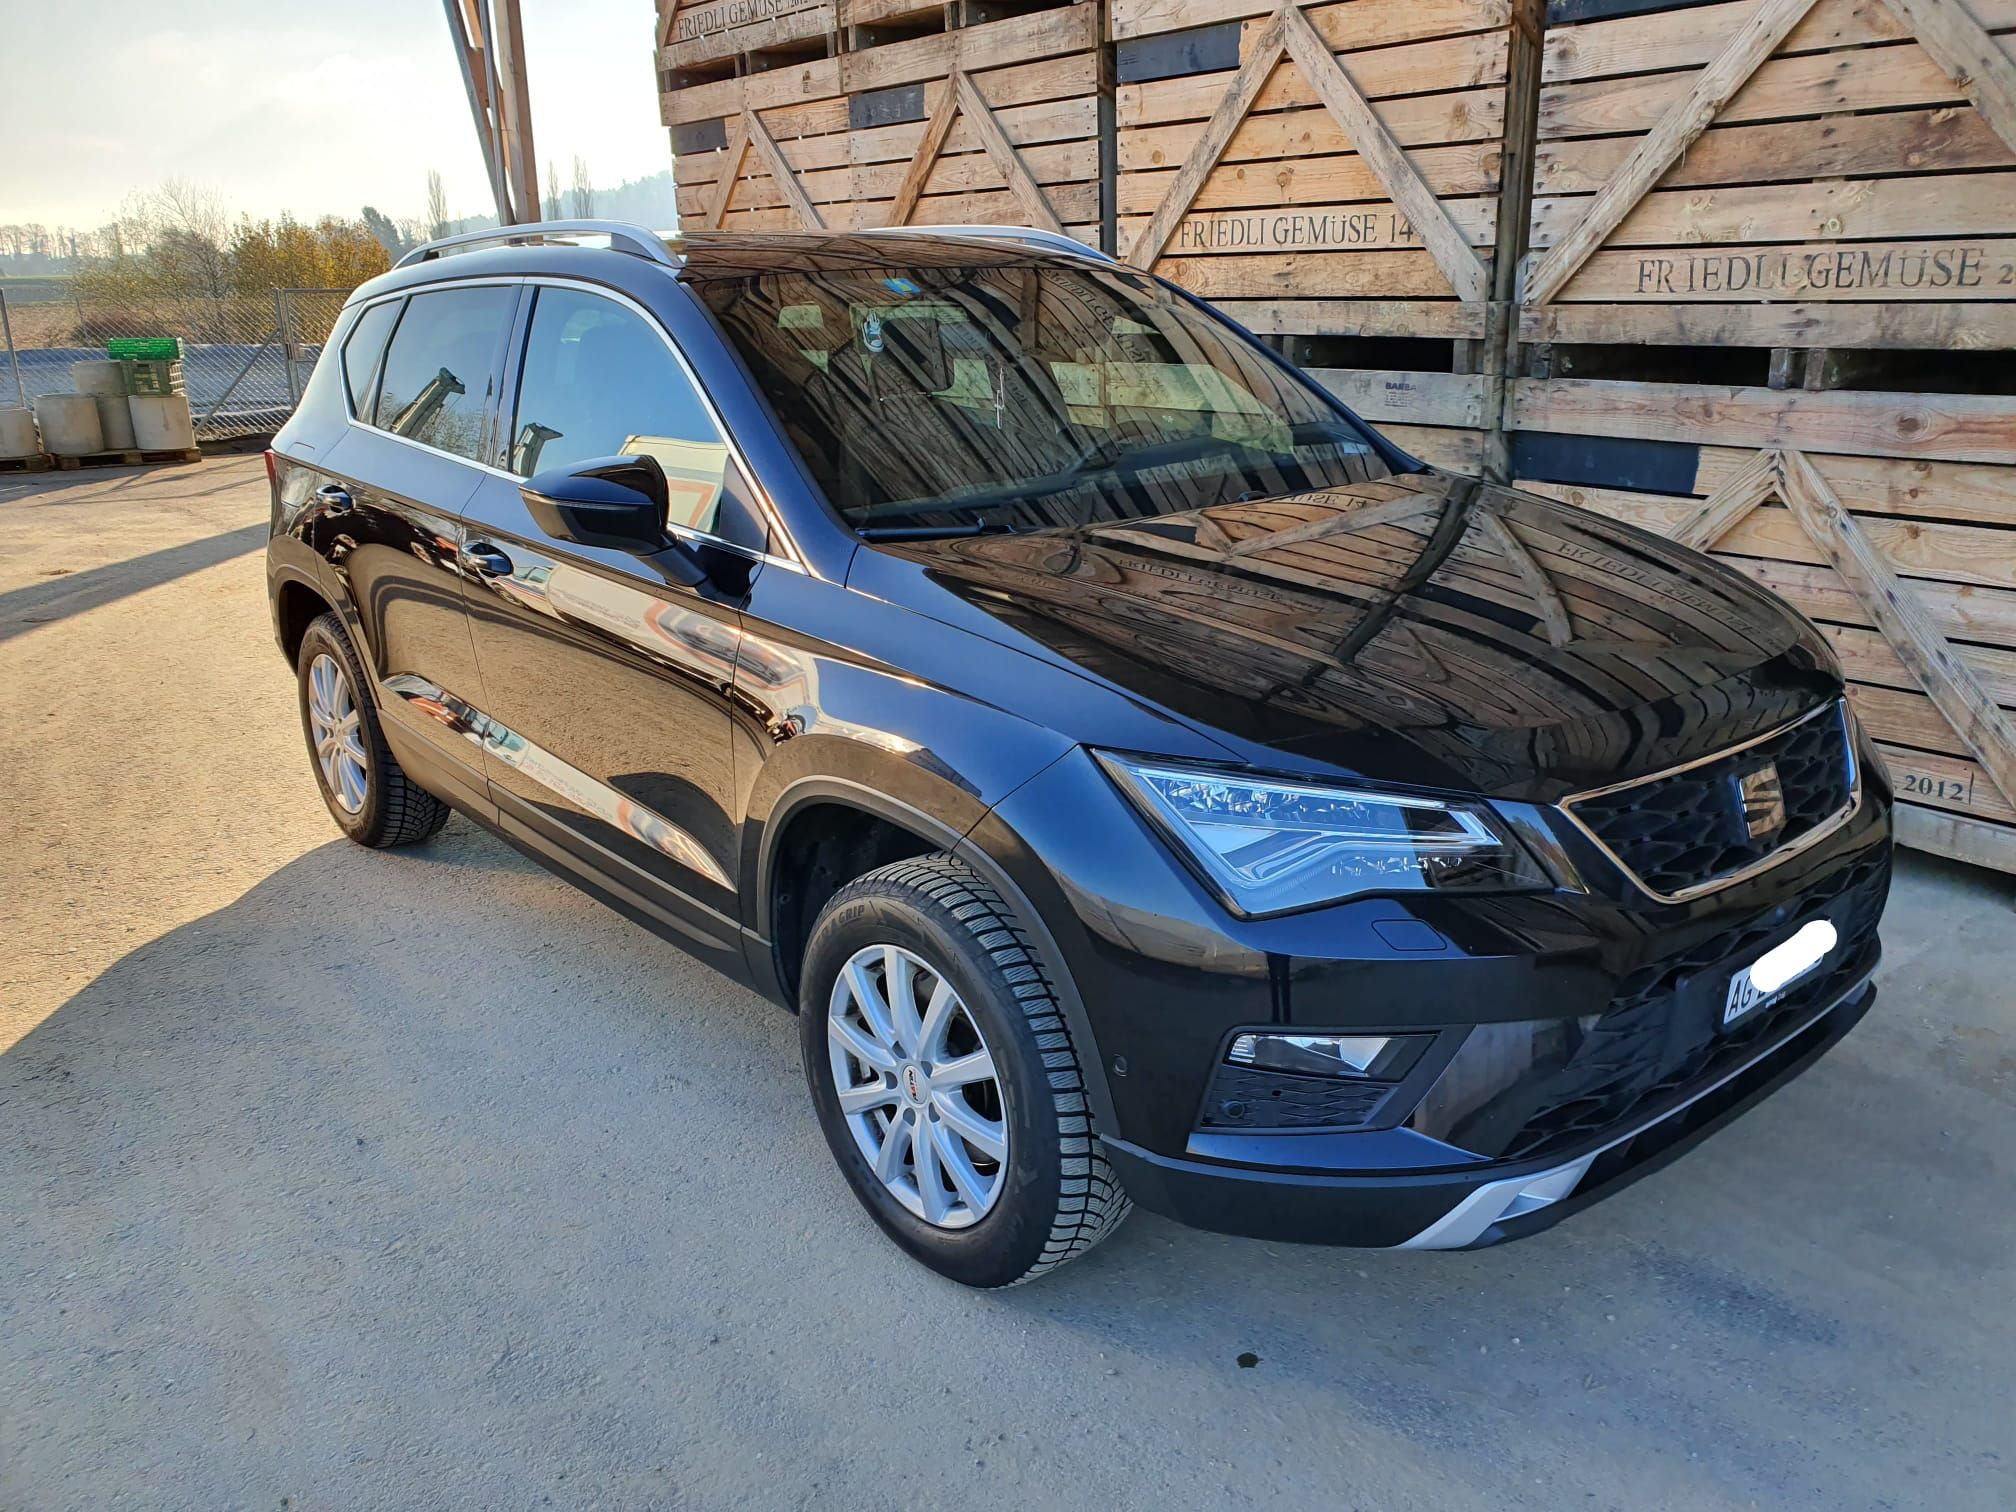 Gebraucht SUV SEAT Ateca 1.4 TSI Xcellence DSG 69500 km ...